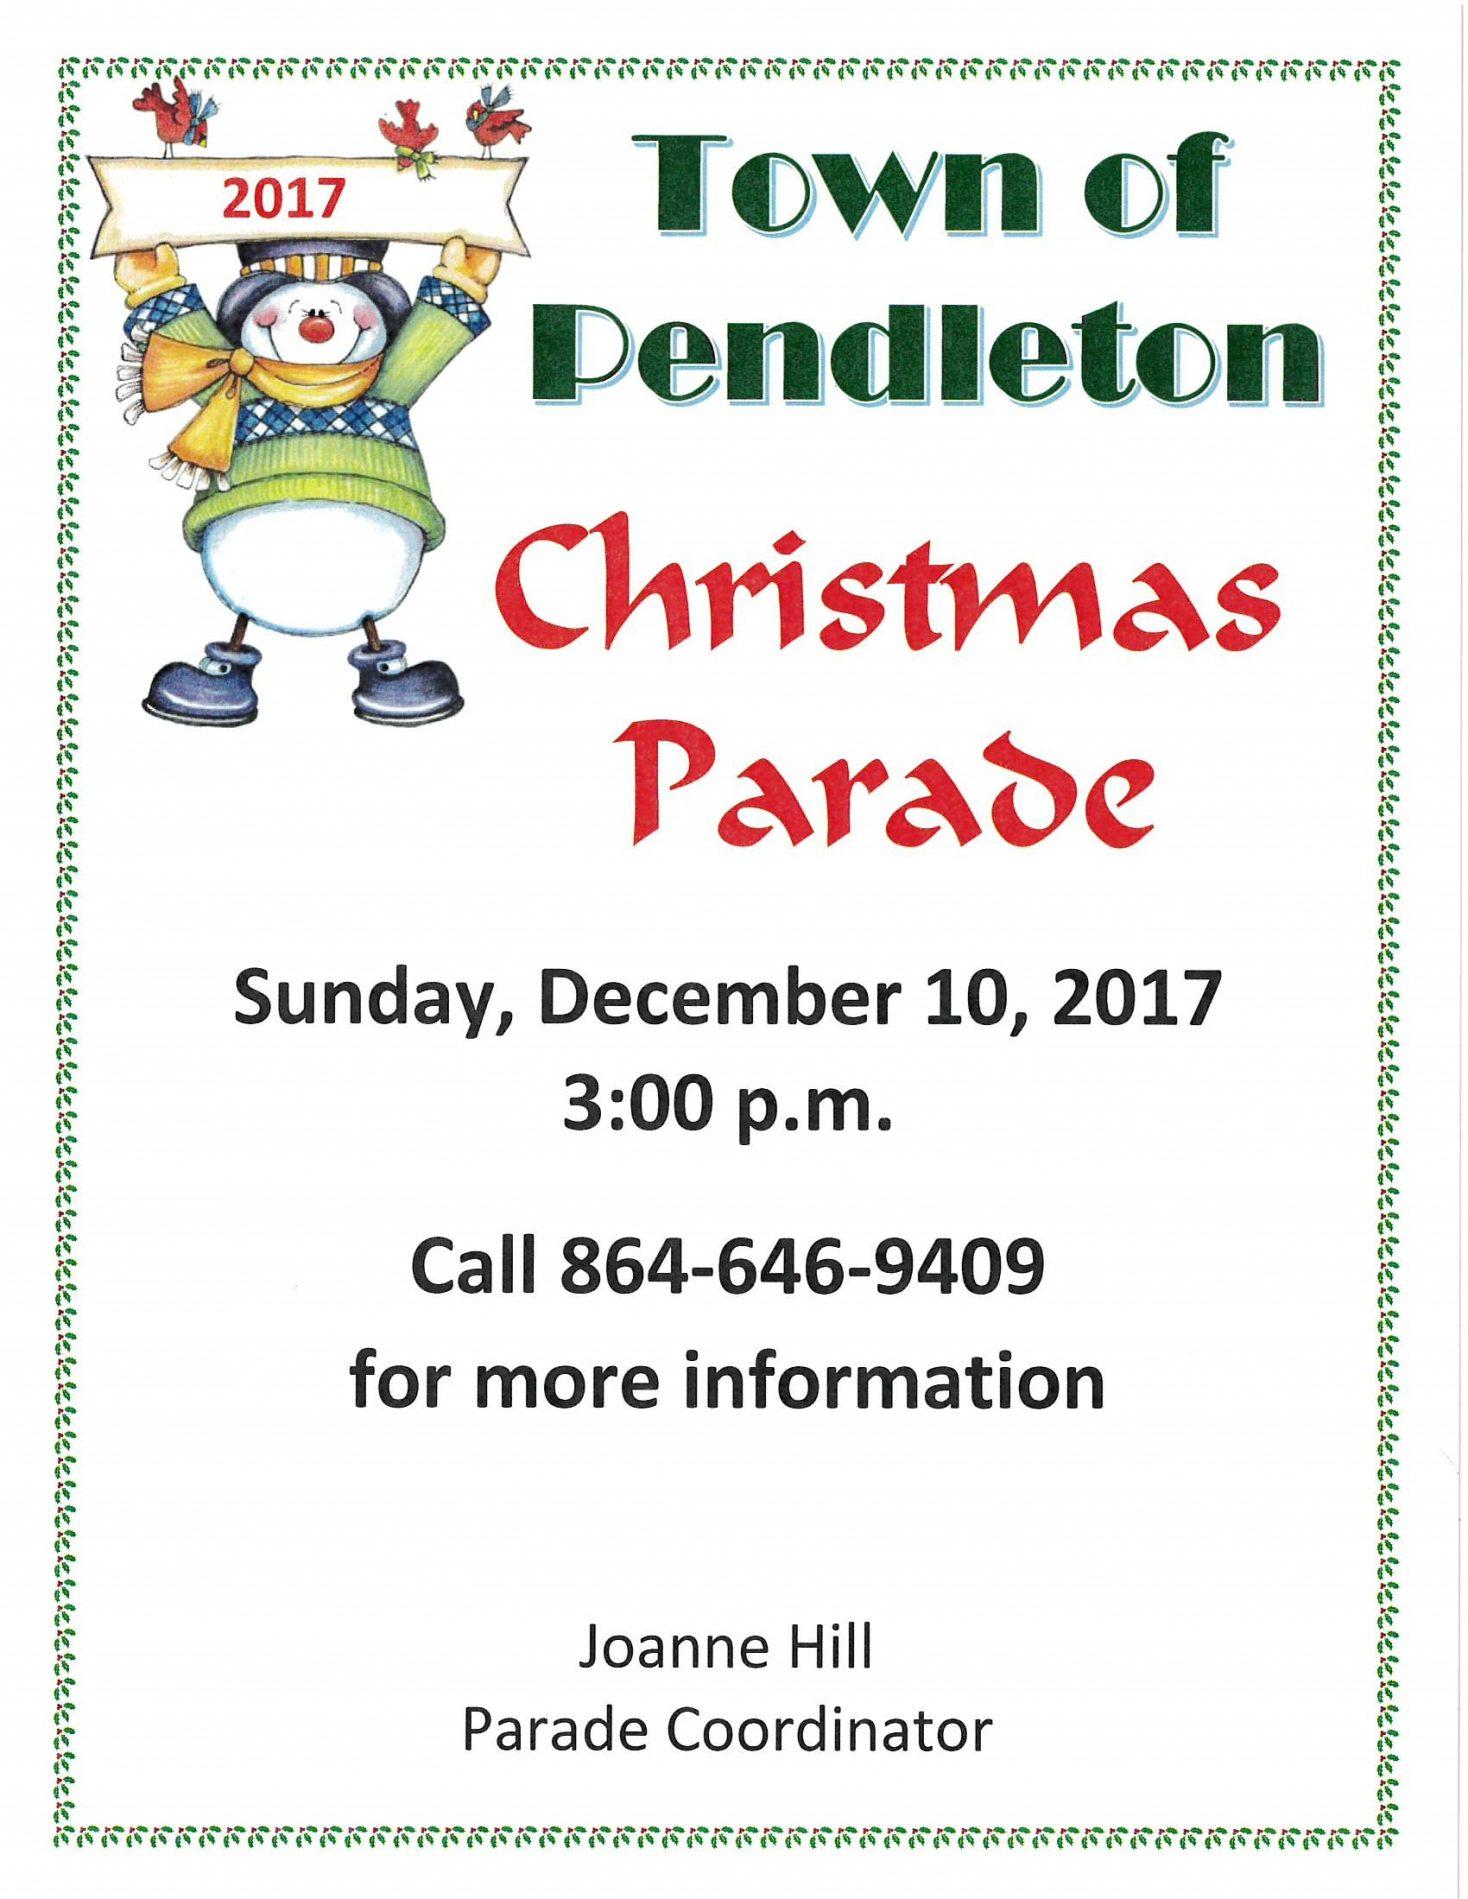 2017 Pendleton Christmas Parade Flyer & Entry Form